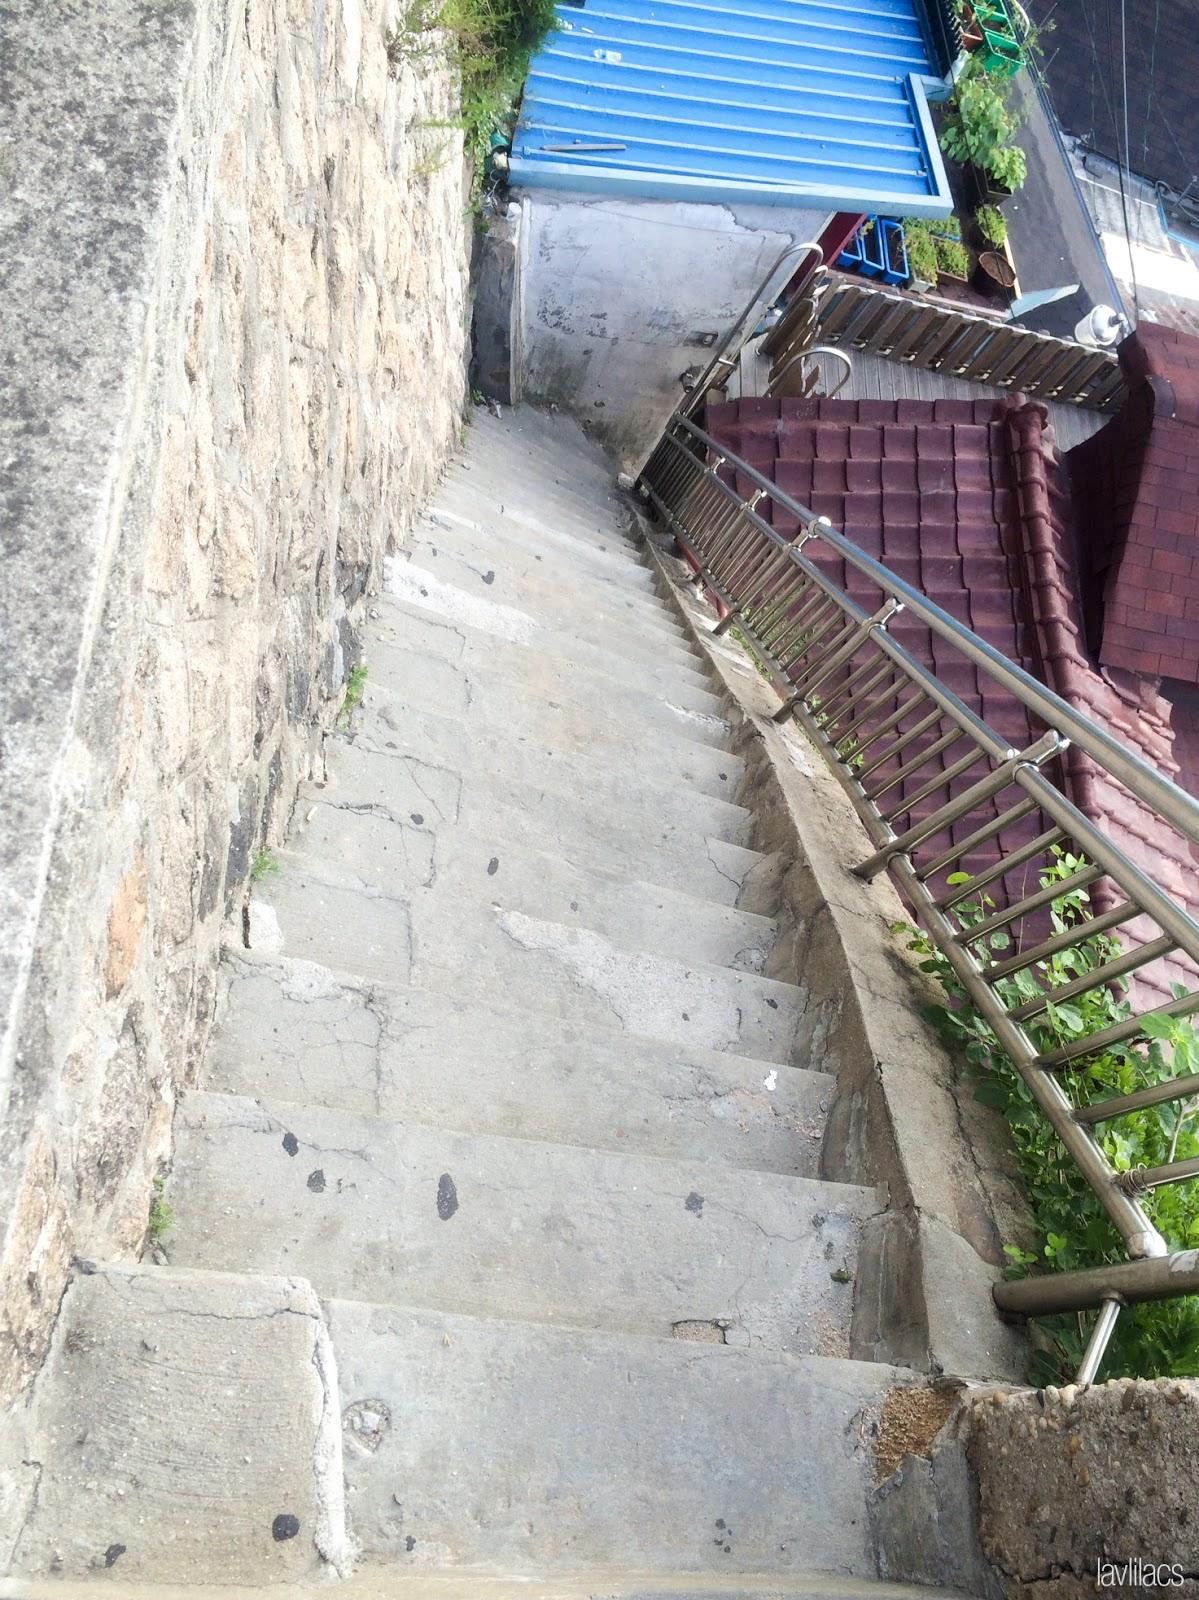 Seoul, Korea - Summer Study Abroad 2014 - Seoul City Touring - Bukchon Hanok Village 북촌한옥마을 北村韓屋마을 drawings